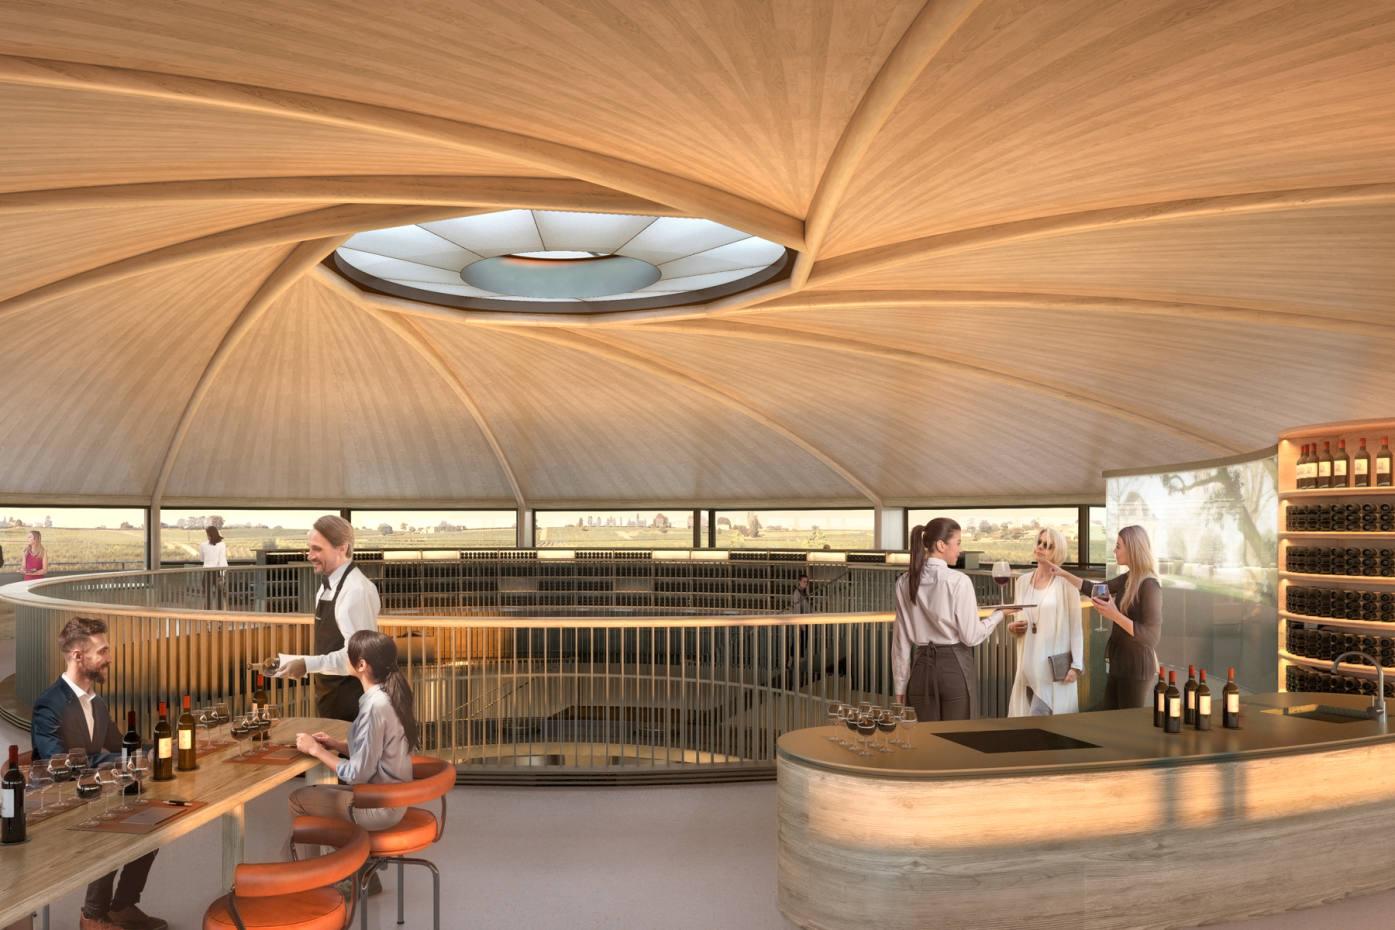 Foster + Partners' new Saint-Emilion showstopper